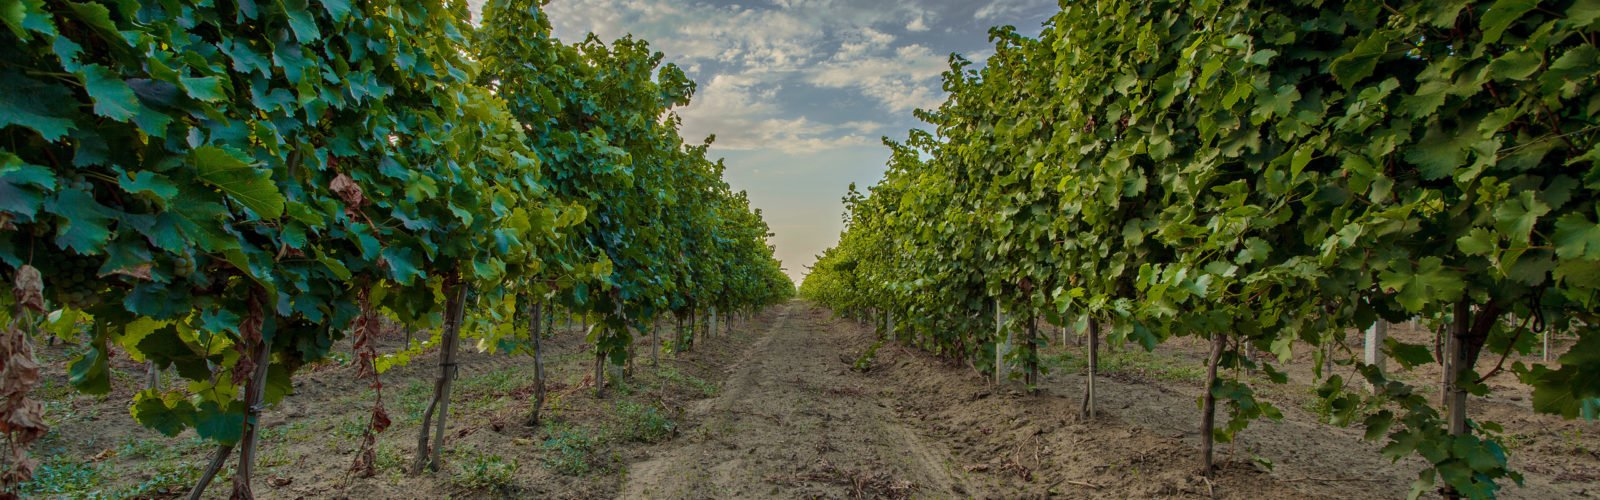 Greek vineyard and grapes